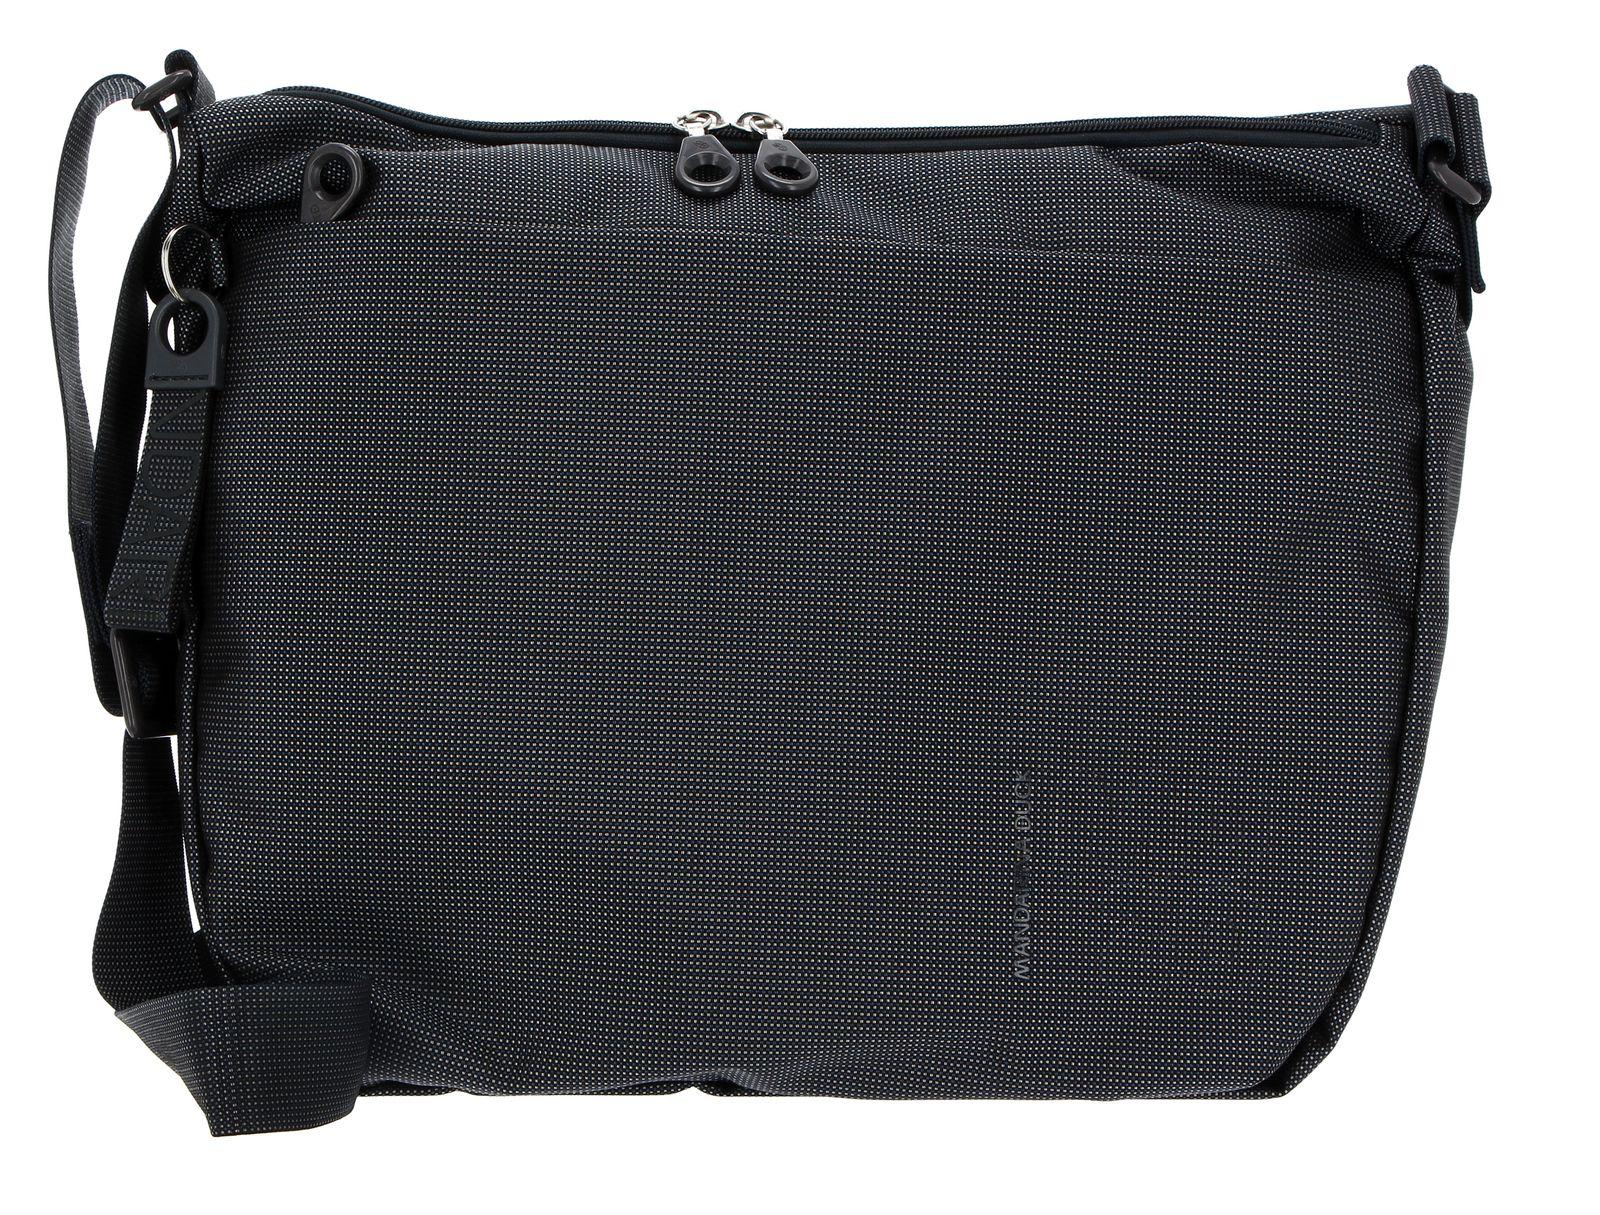 MANDARINA DUCK MD20 Hobo Bag Steel